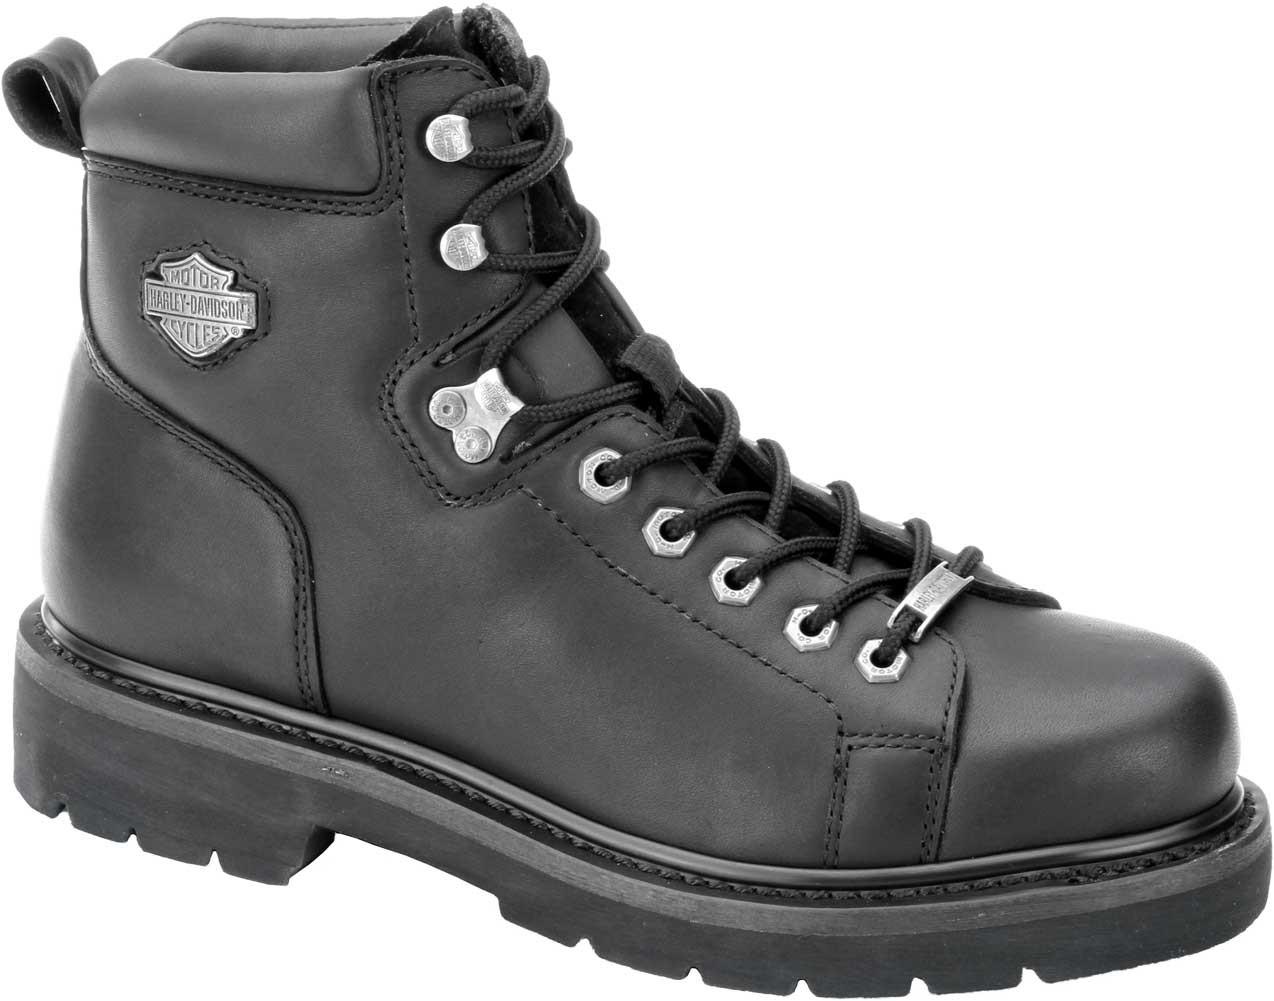 ed1e47e20bec Harley-Davidson® Men s Barton 5-Inch Black Motorcycle Boots. D93199 -  Wisconsin Harley-Davidson